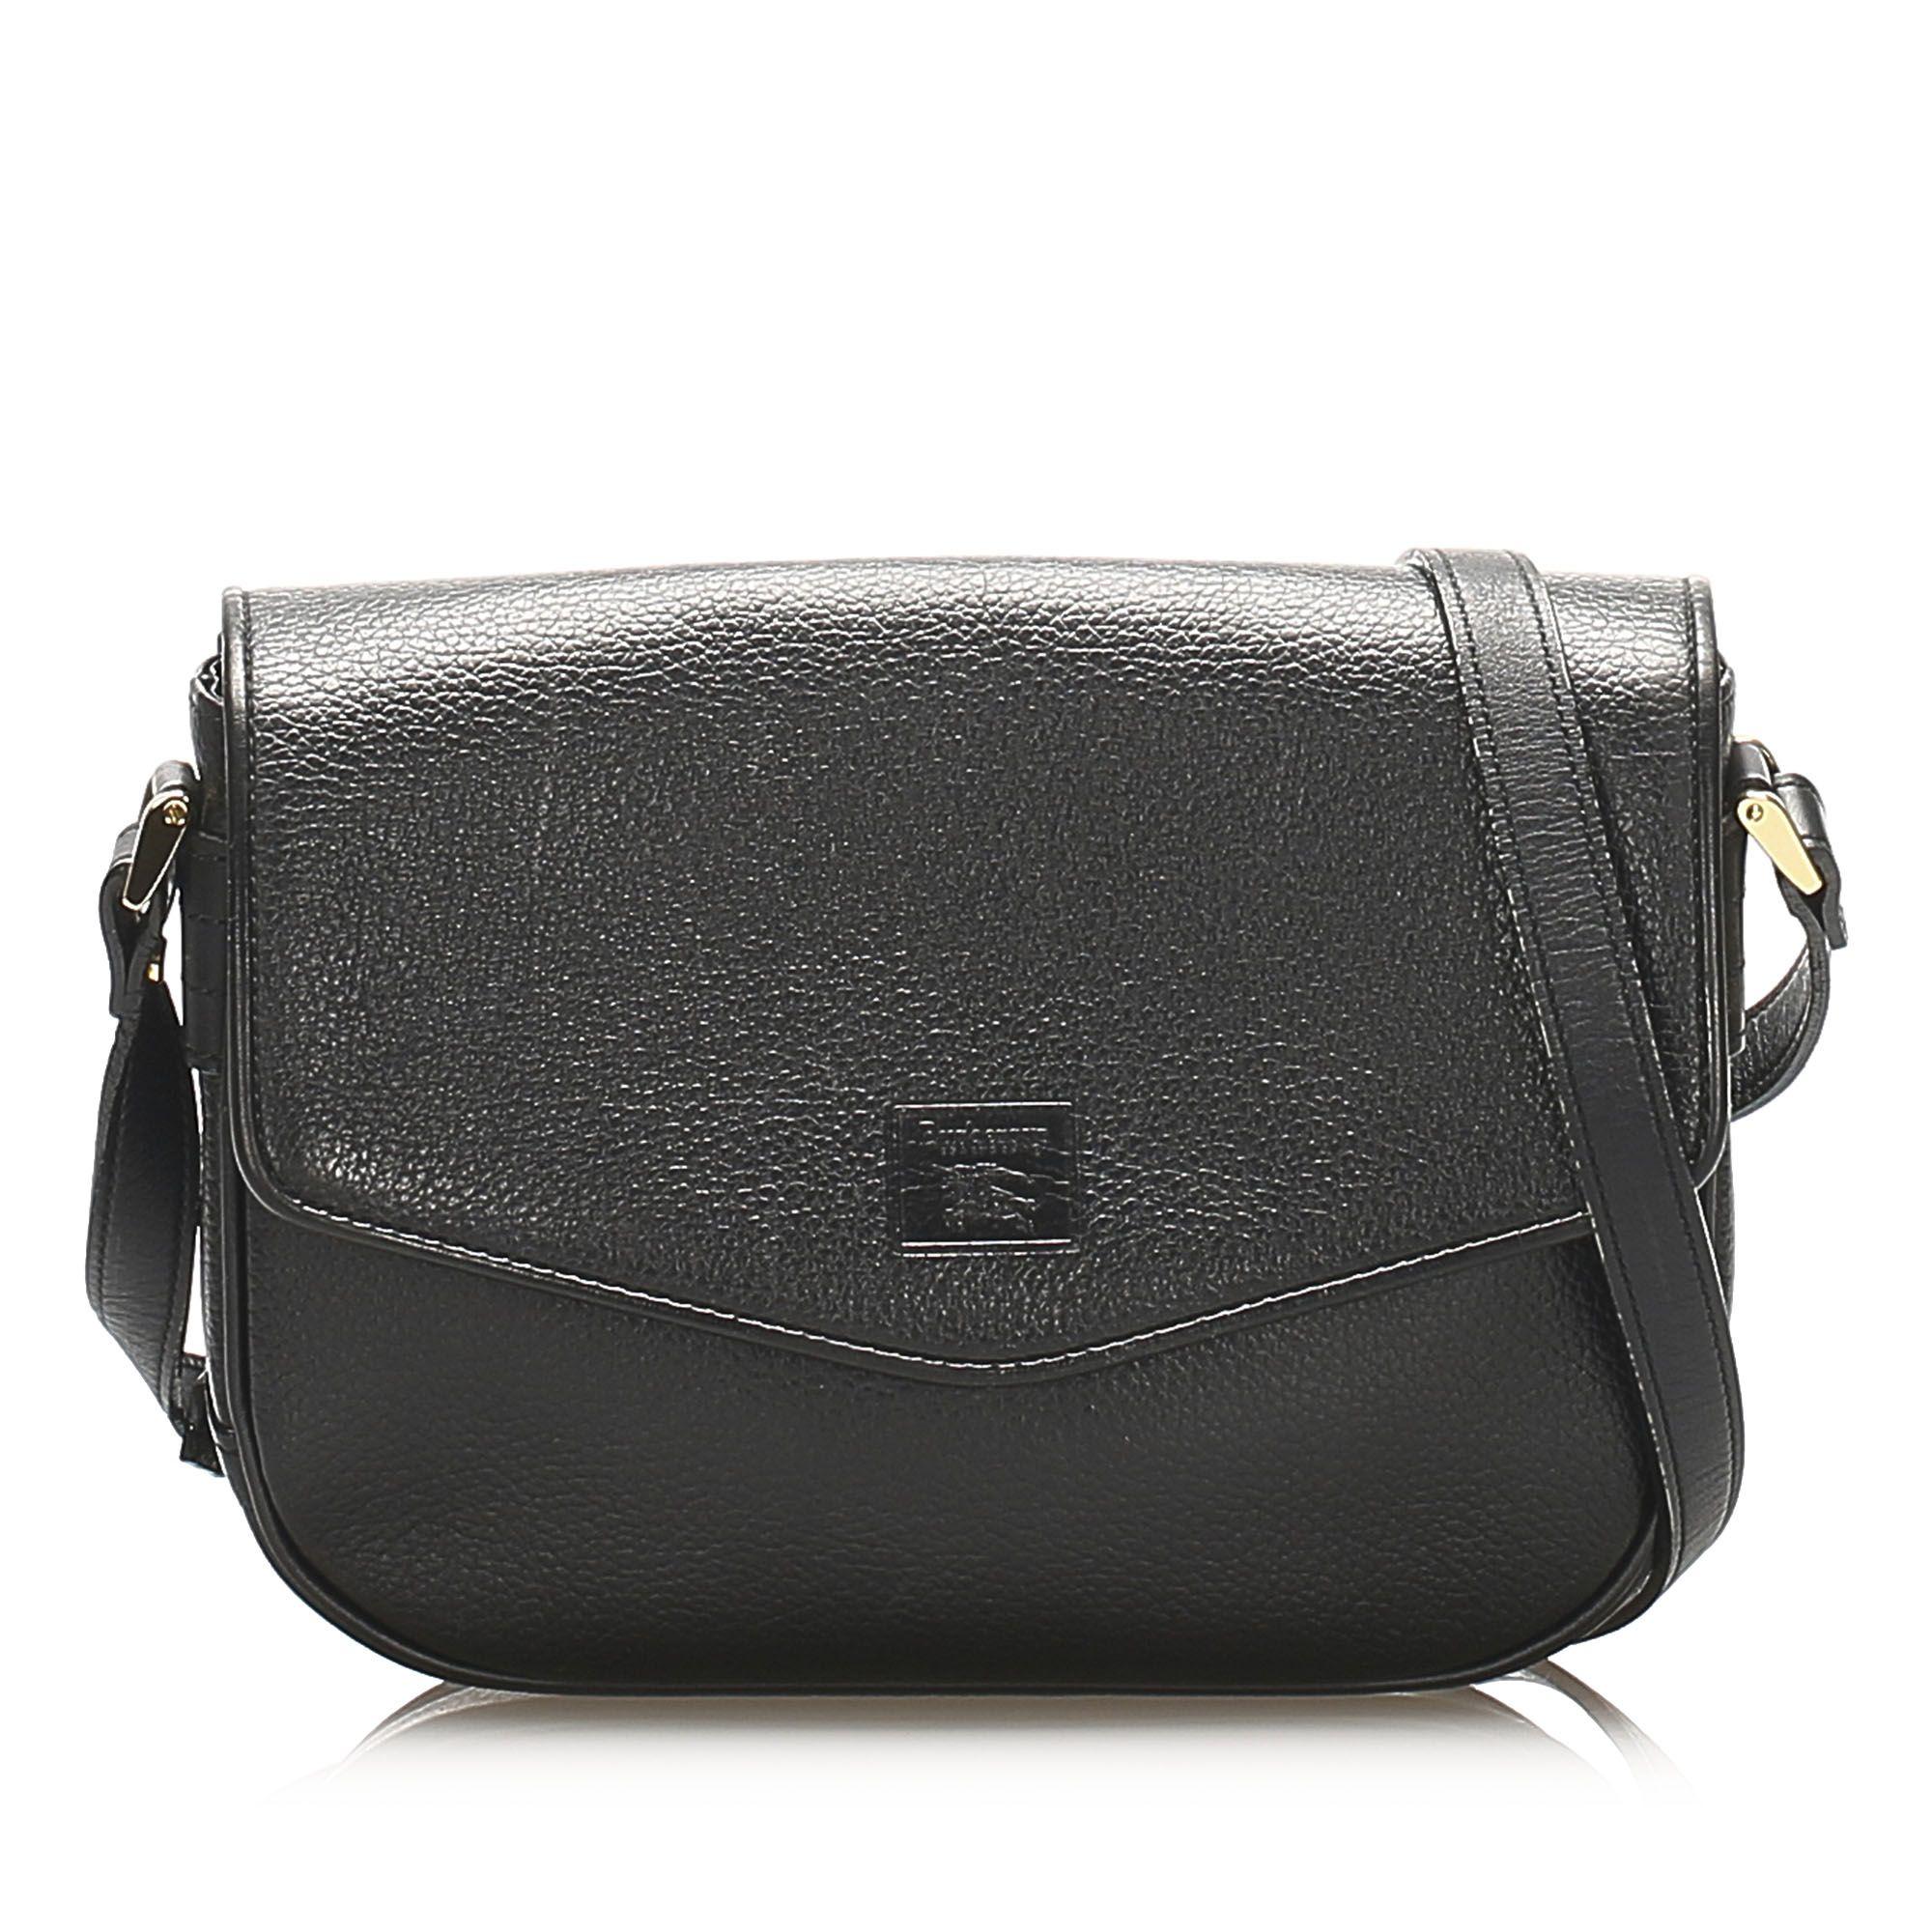 Vintage Burberry Leather Crossbody Bag Black